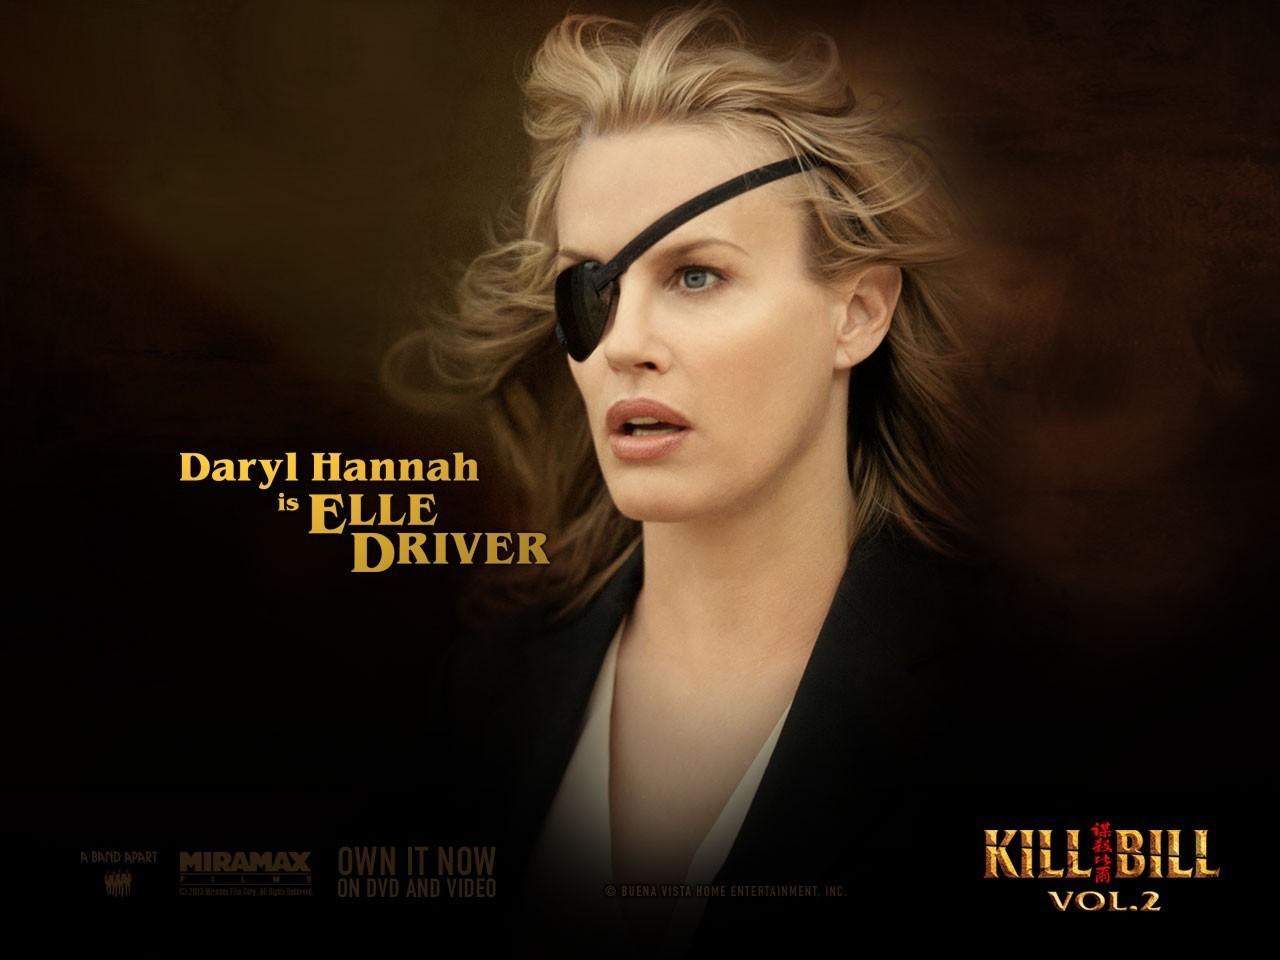 Daryl Hannah Kill Bill